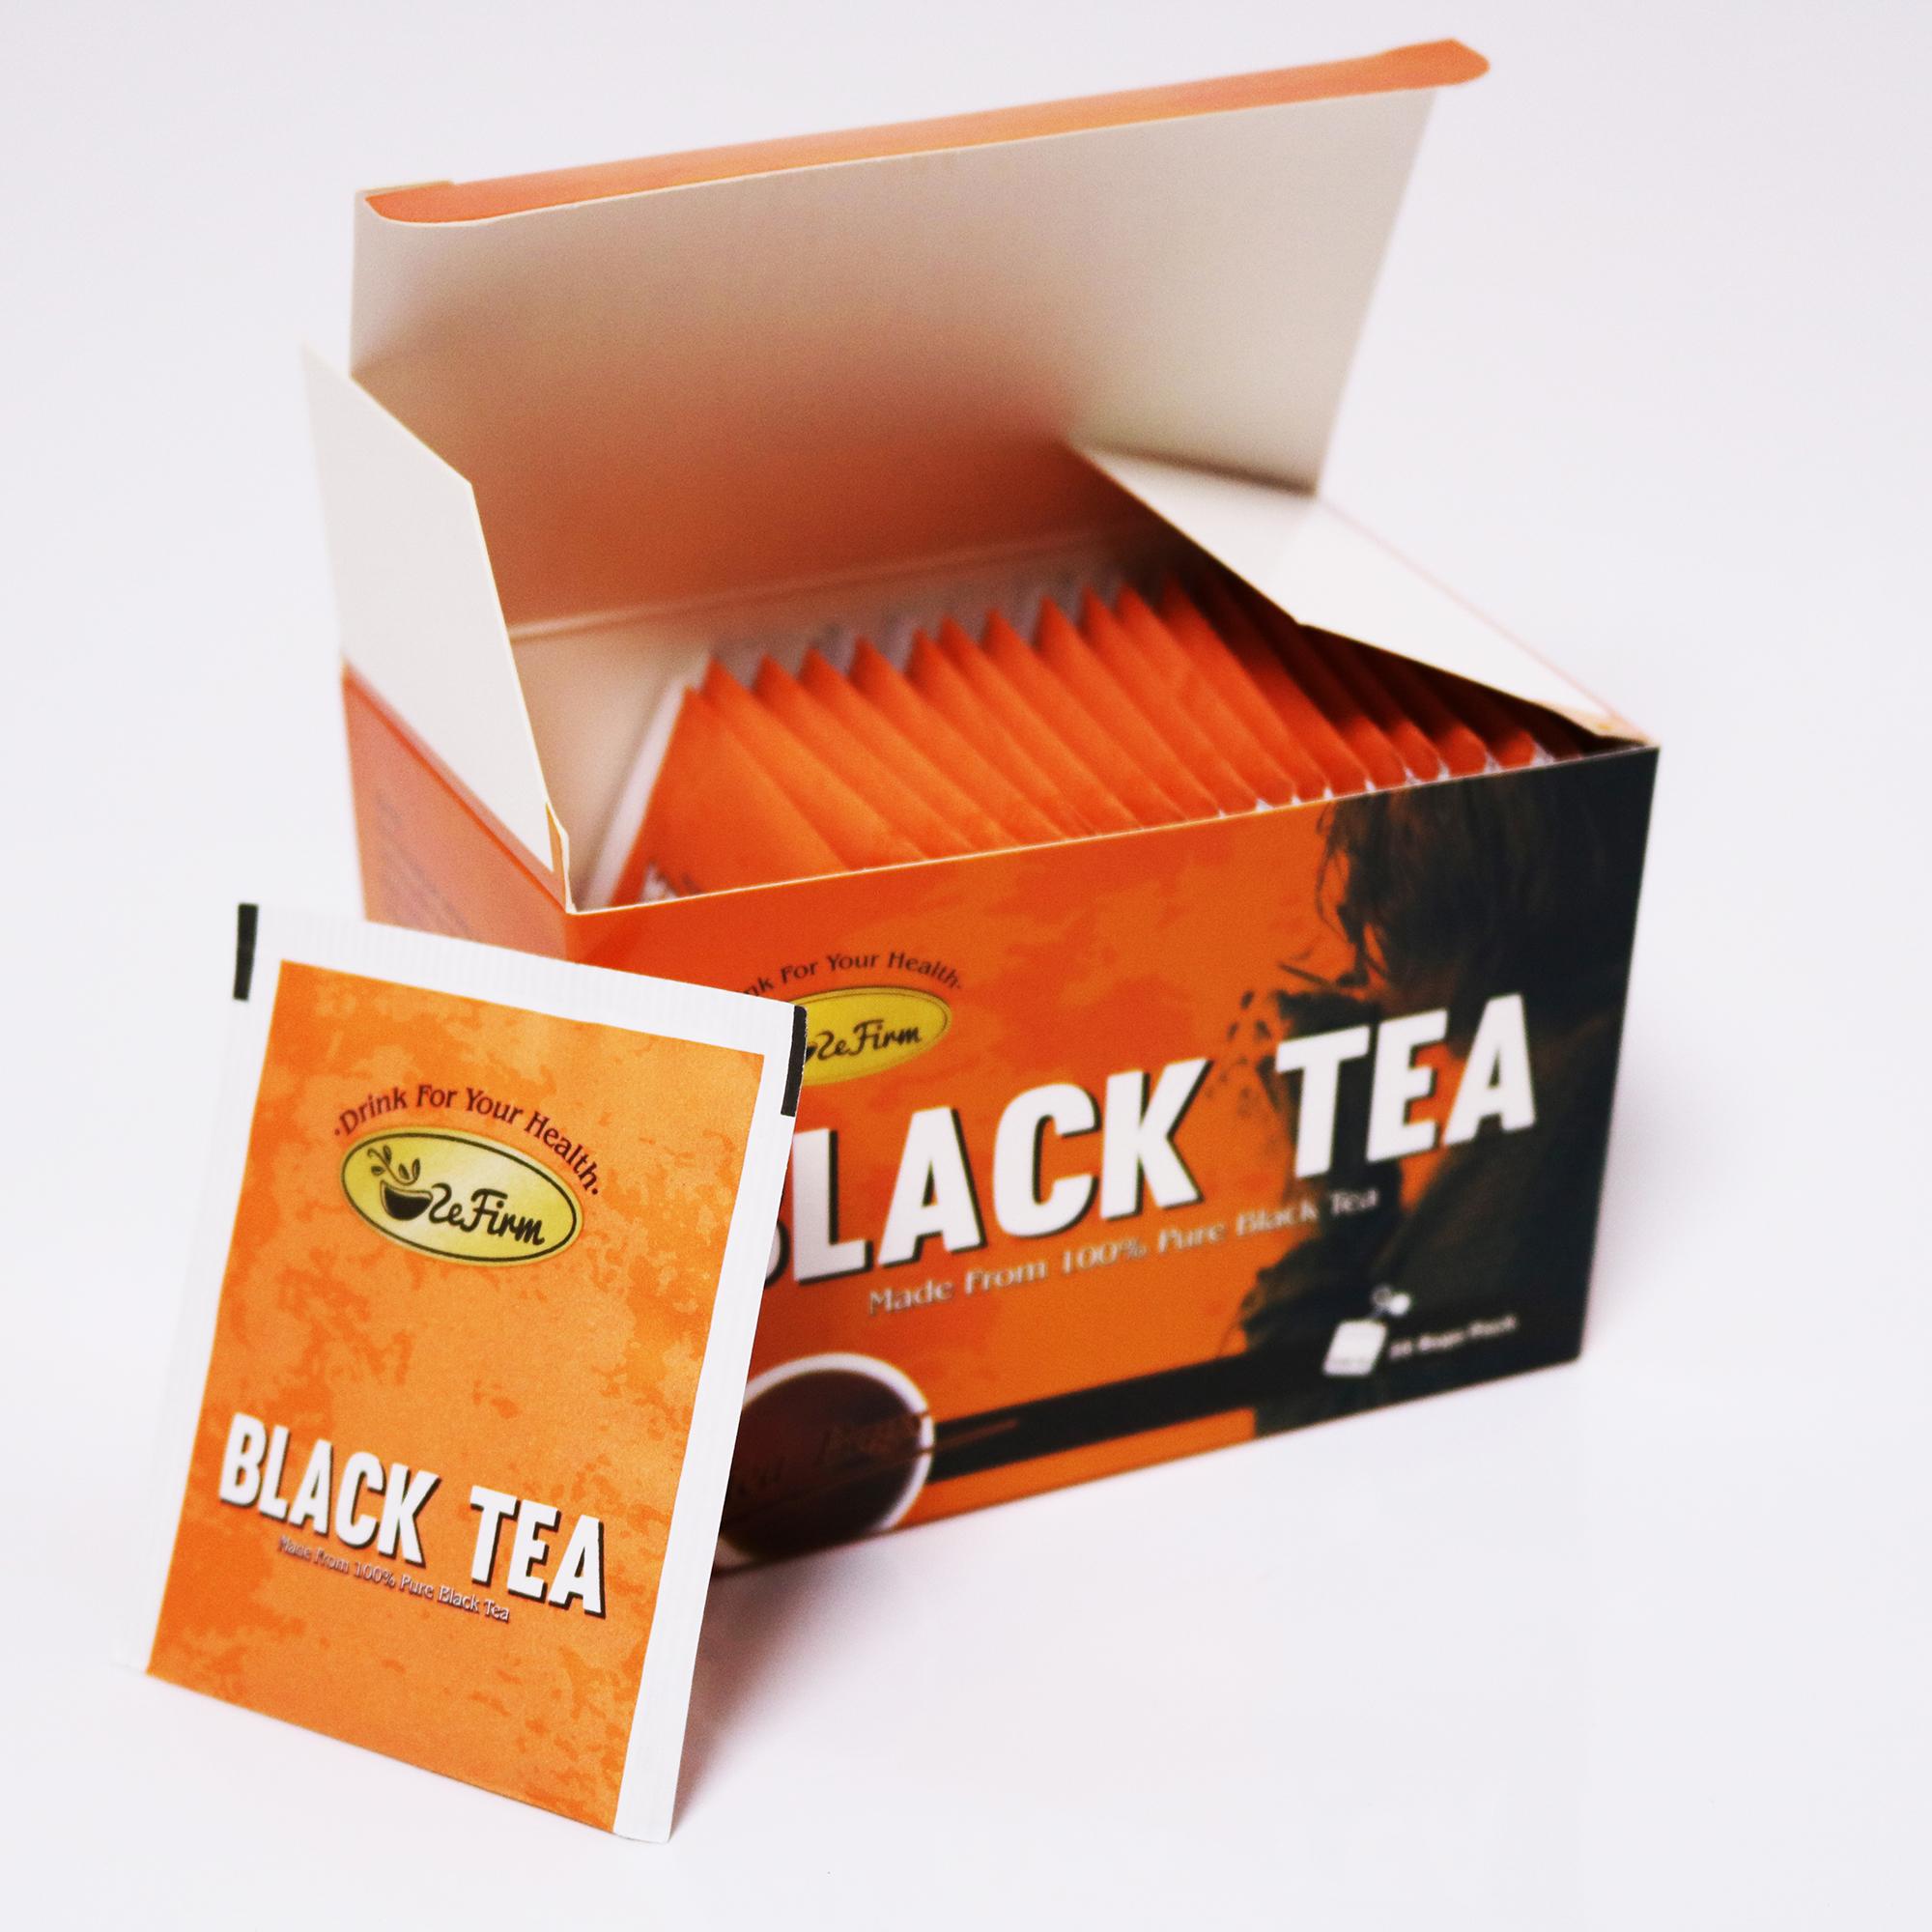 2g * 20teabags single chamble teabag black tea - 4uTea | 4uTea.com